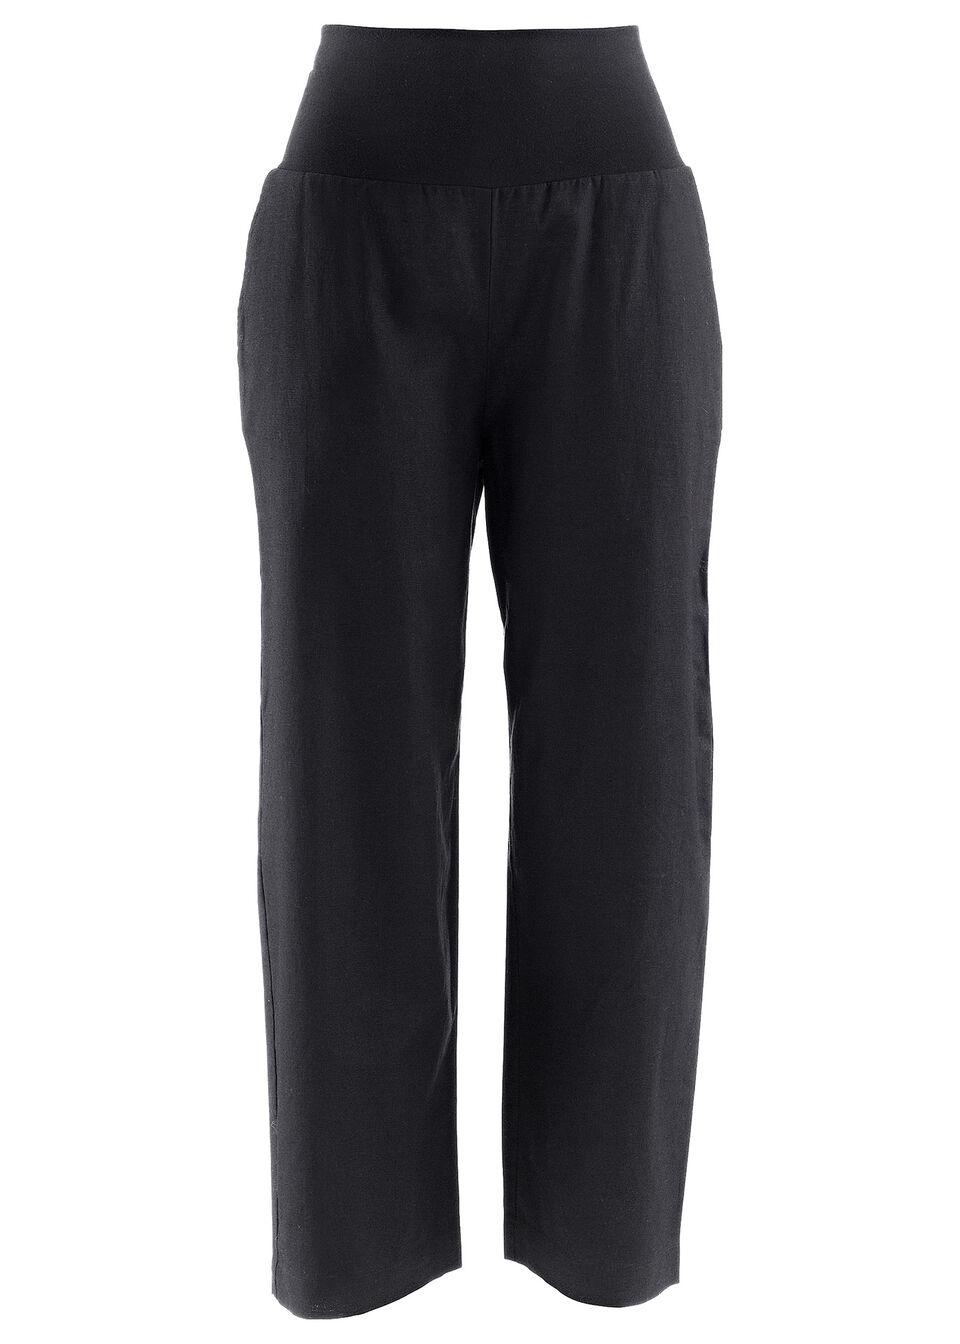 Pantalon 7/8 cu in, largi bonprix